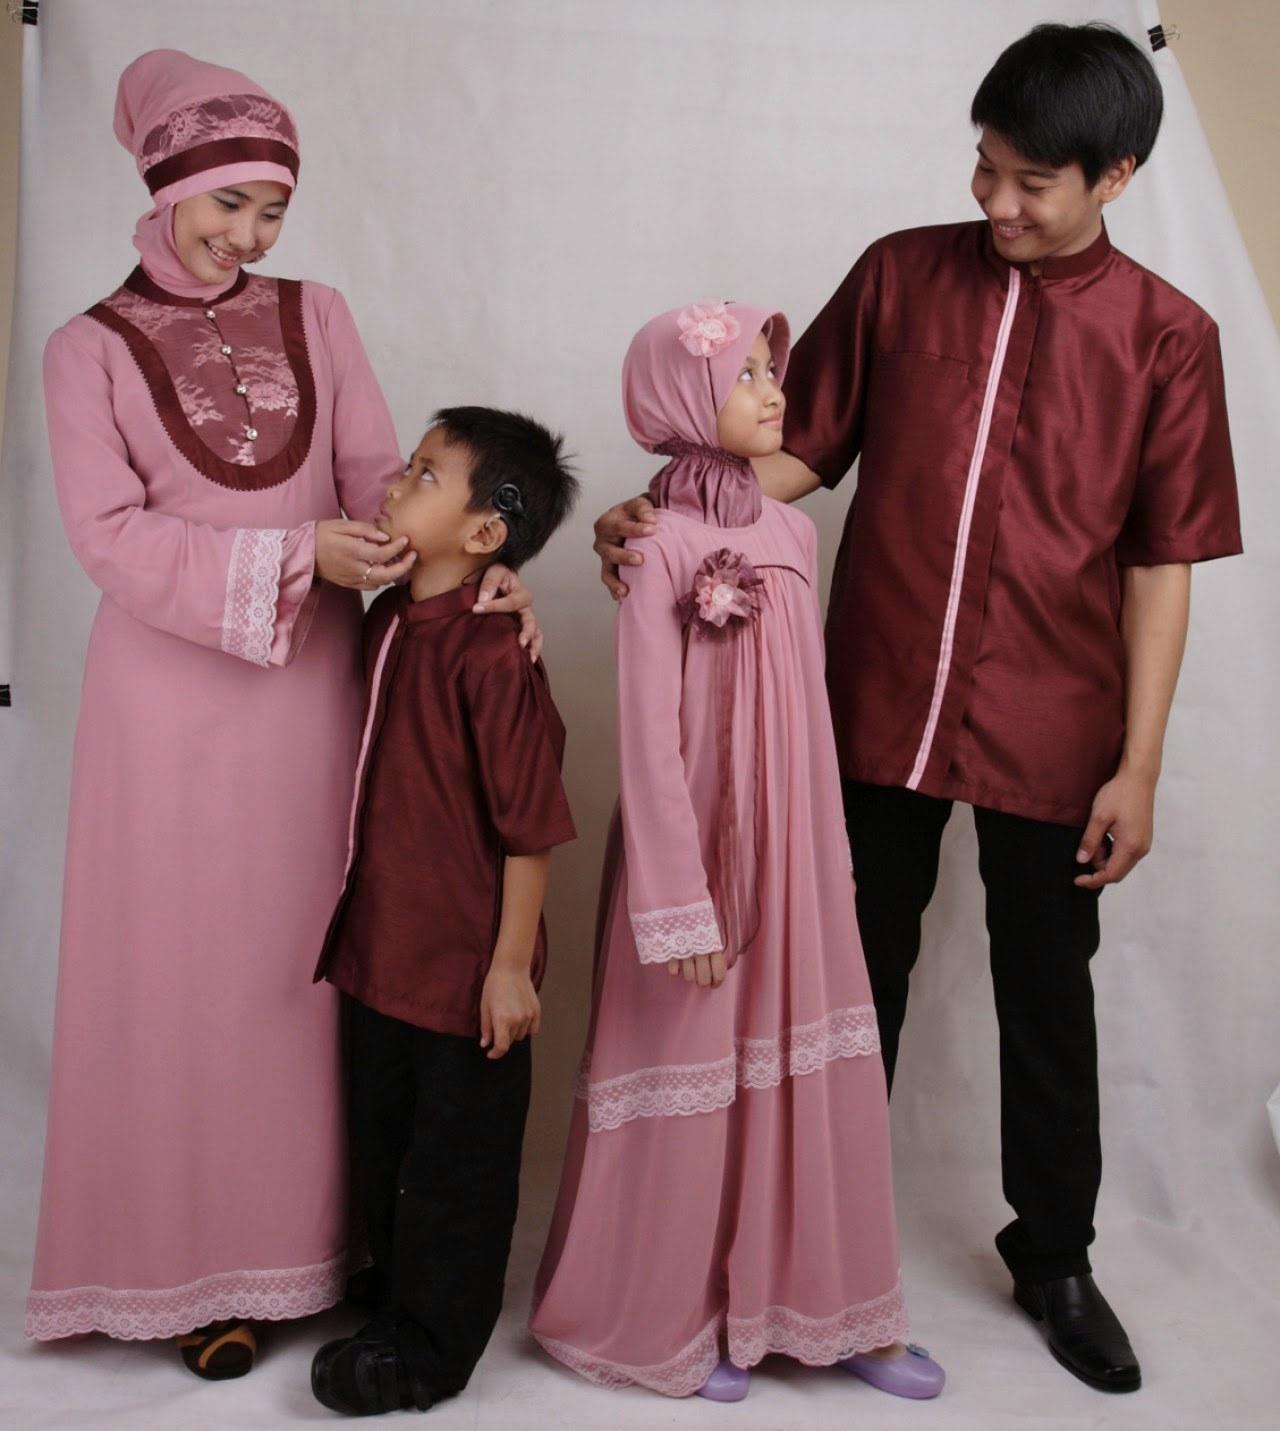 Bentuk Seragam Baju Lebaran Kvdd Model Baju Keluarga Muslim Seragam Kembar Terbaru 2018